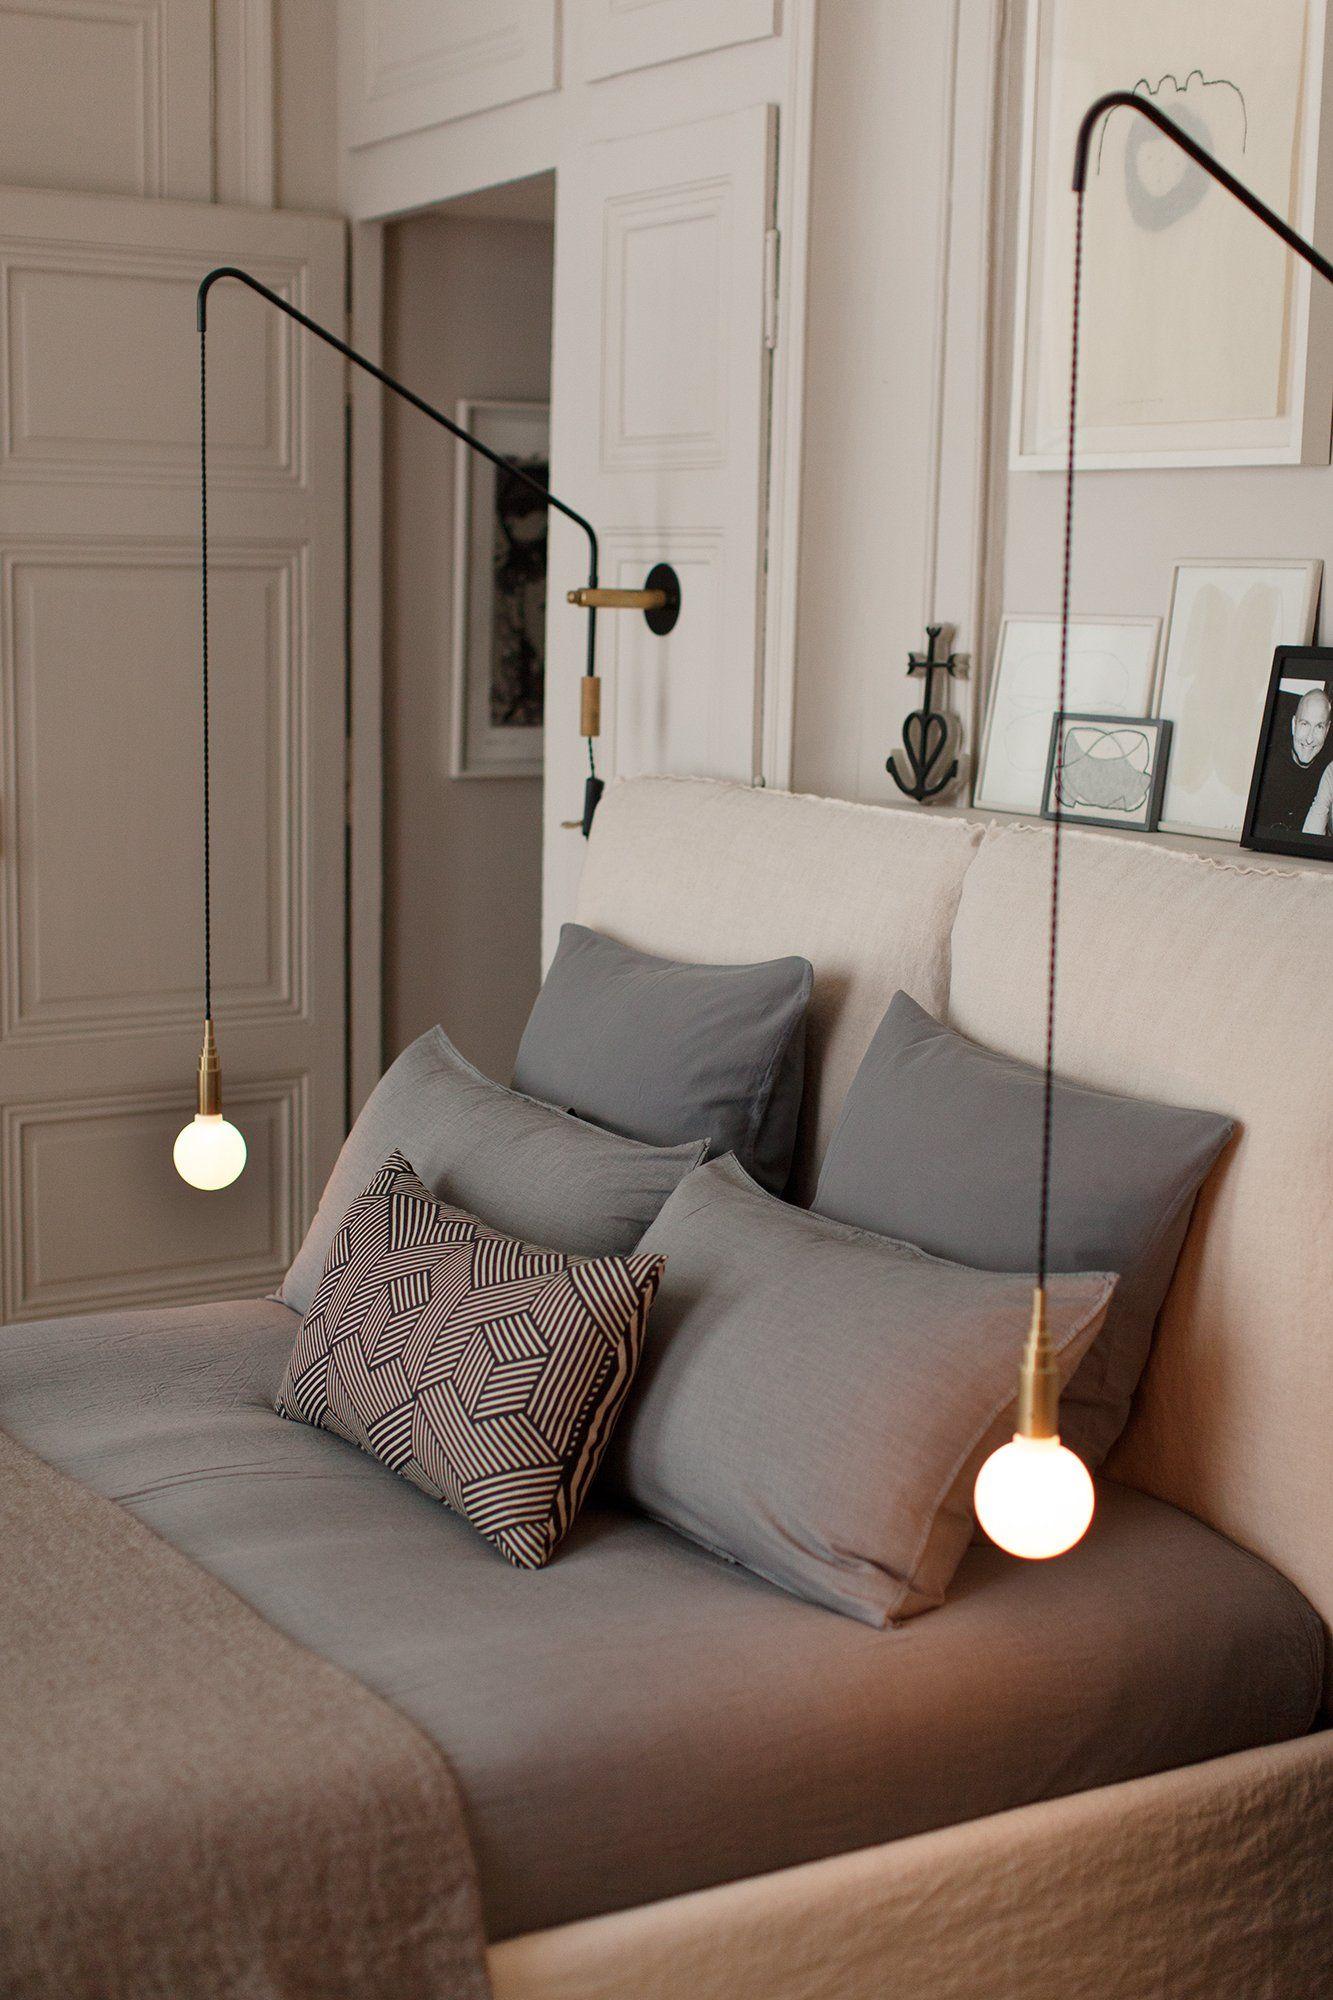 Maison Hand, entre artisanat et modernisme | Schlafzimmer ...